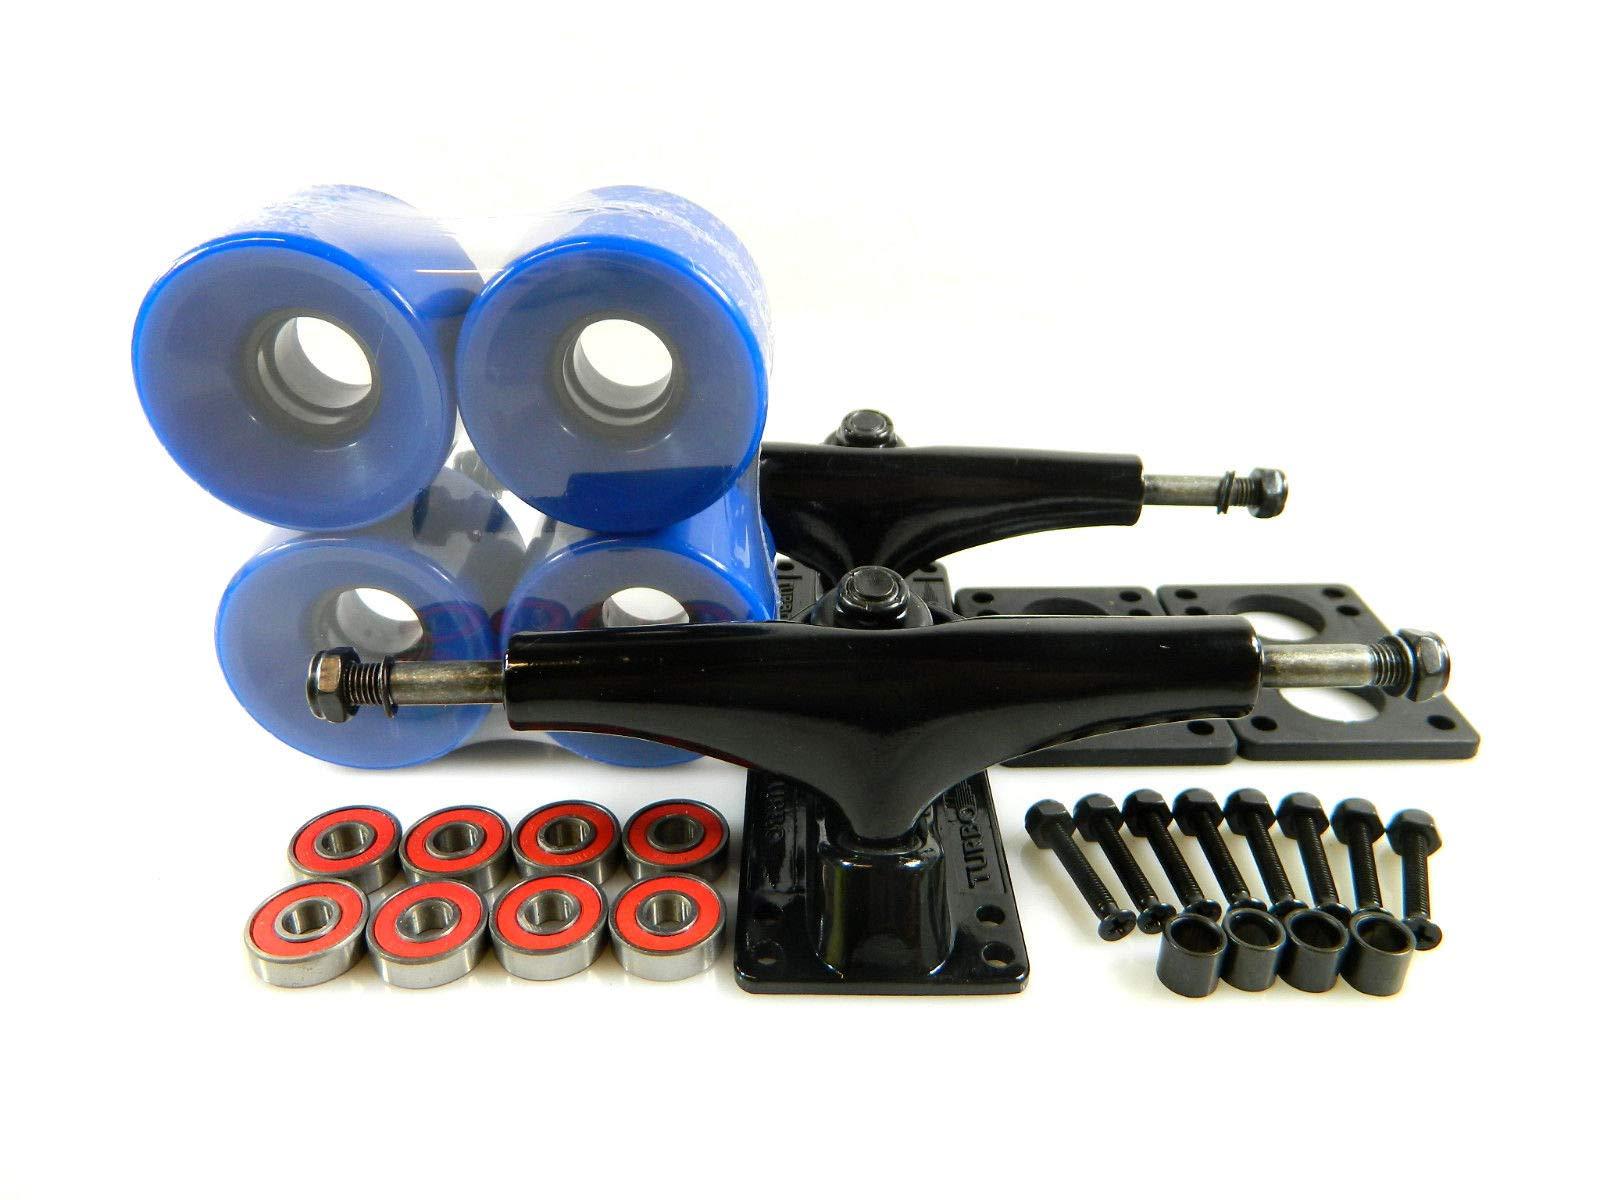 Blue Turbo 5.25 Blk Skateboard Trucks + 60Mm Cruiser Wheels ABEC 7 Bearings Riser Pad